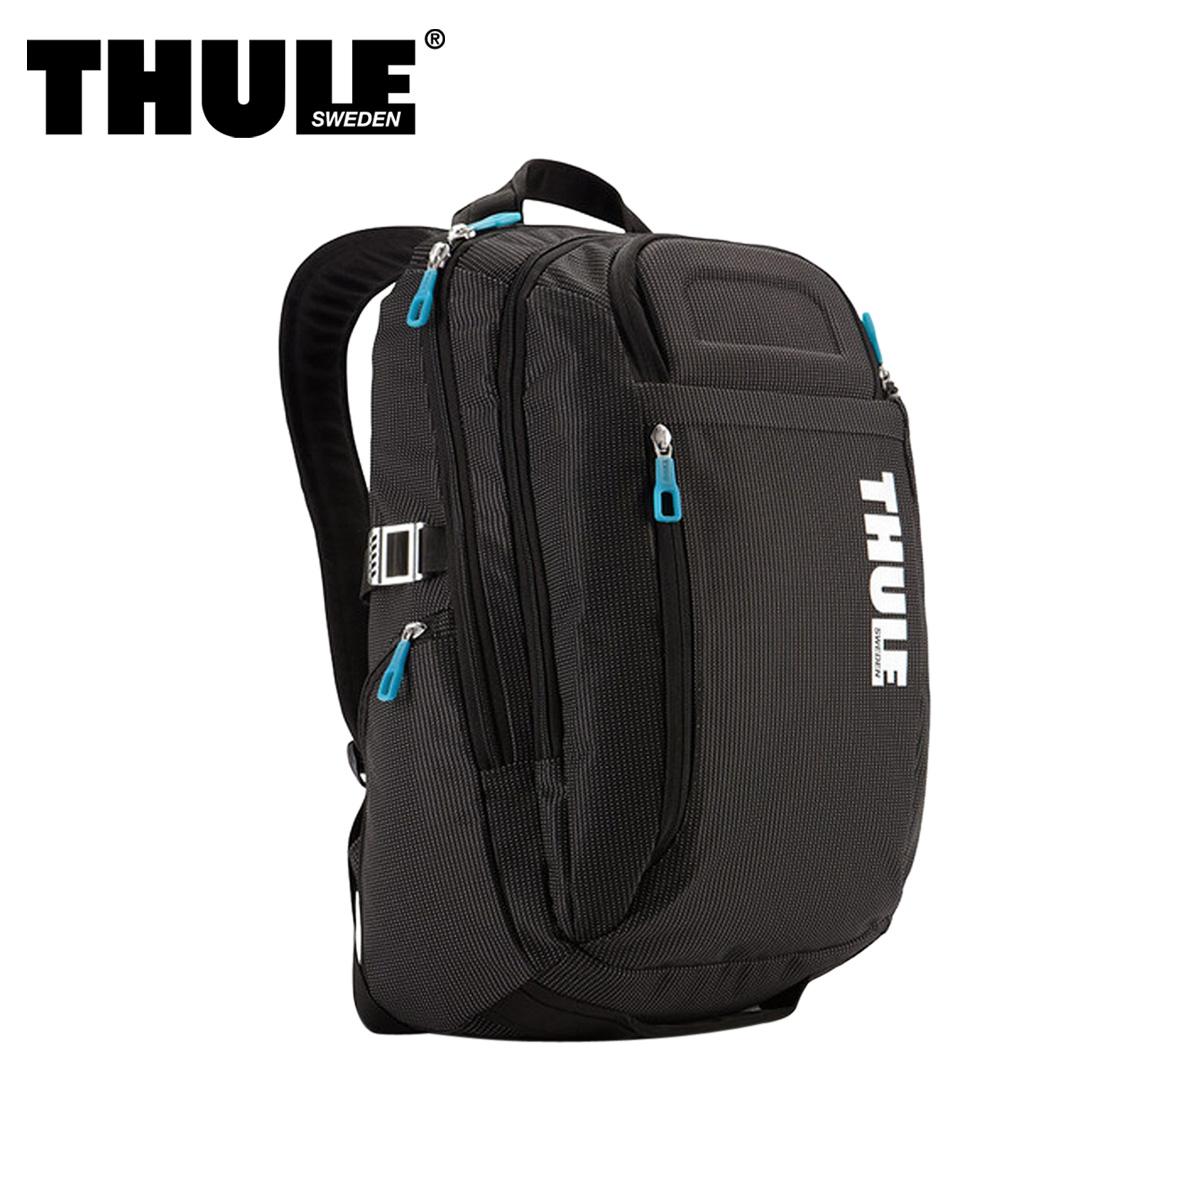 THULE CROSSOVER BACKPACK スーリー リュック バッグ バックパック クロスオーバー メンズ レディース 21L ブラック 黒 3201751